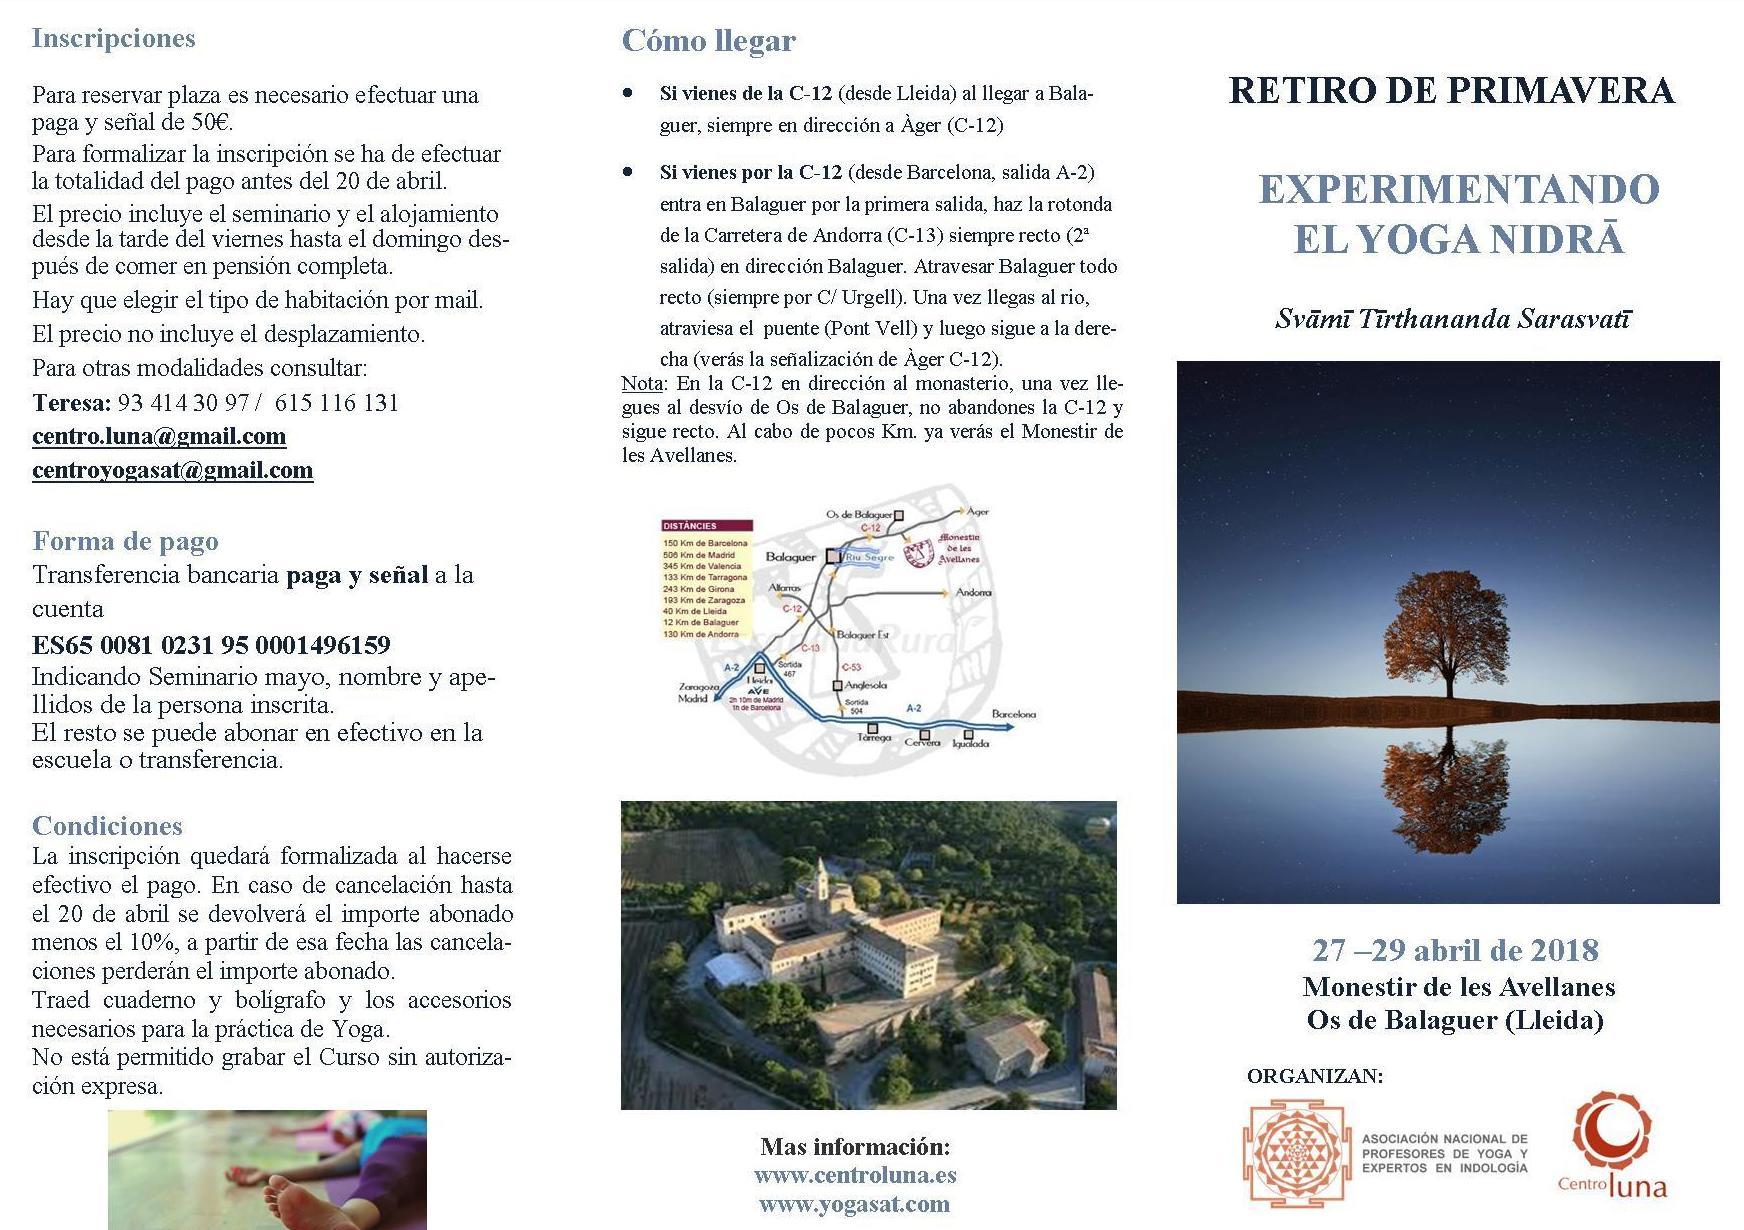 RETIRO DE YOGA - EXPERIMENTANDO EL YOGA NIDRA